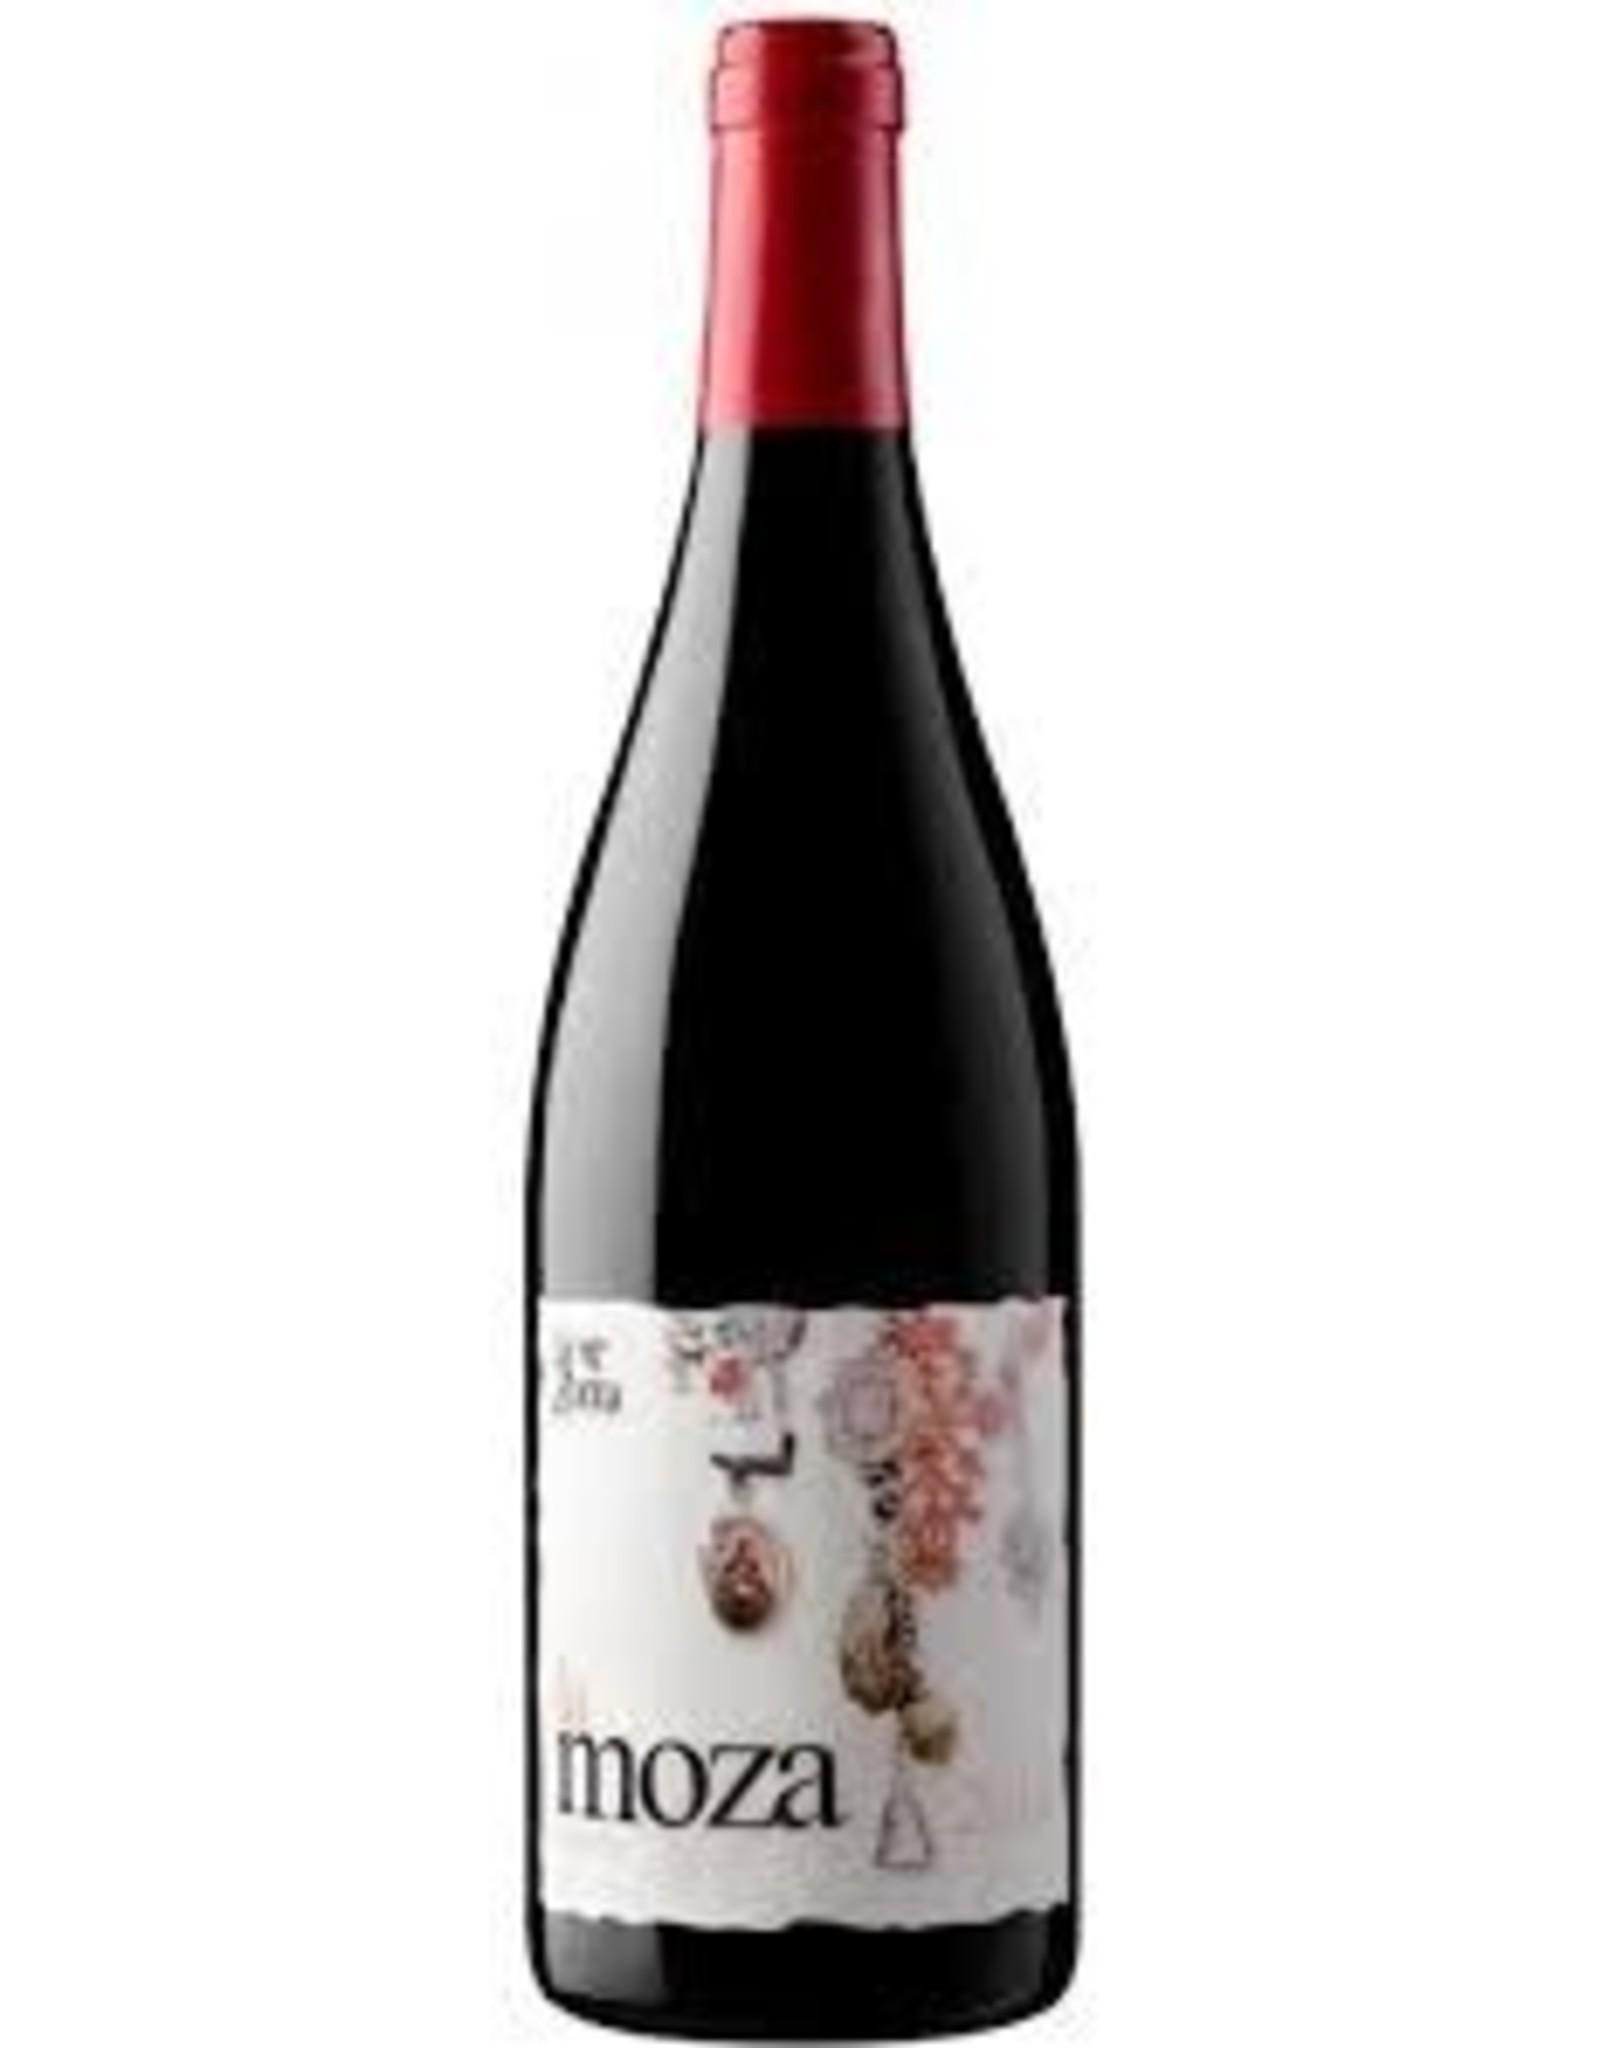 La Zorra La Moza sel. esp. Calabres